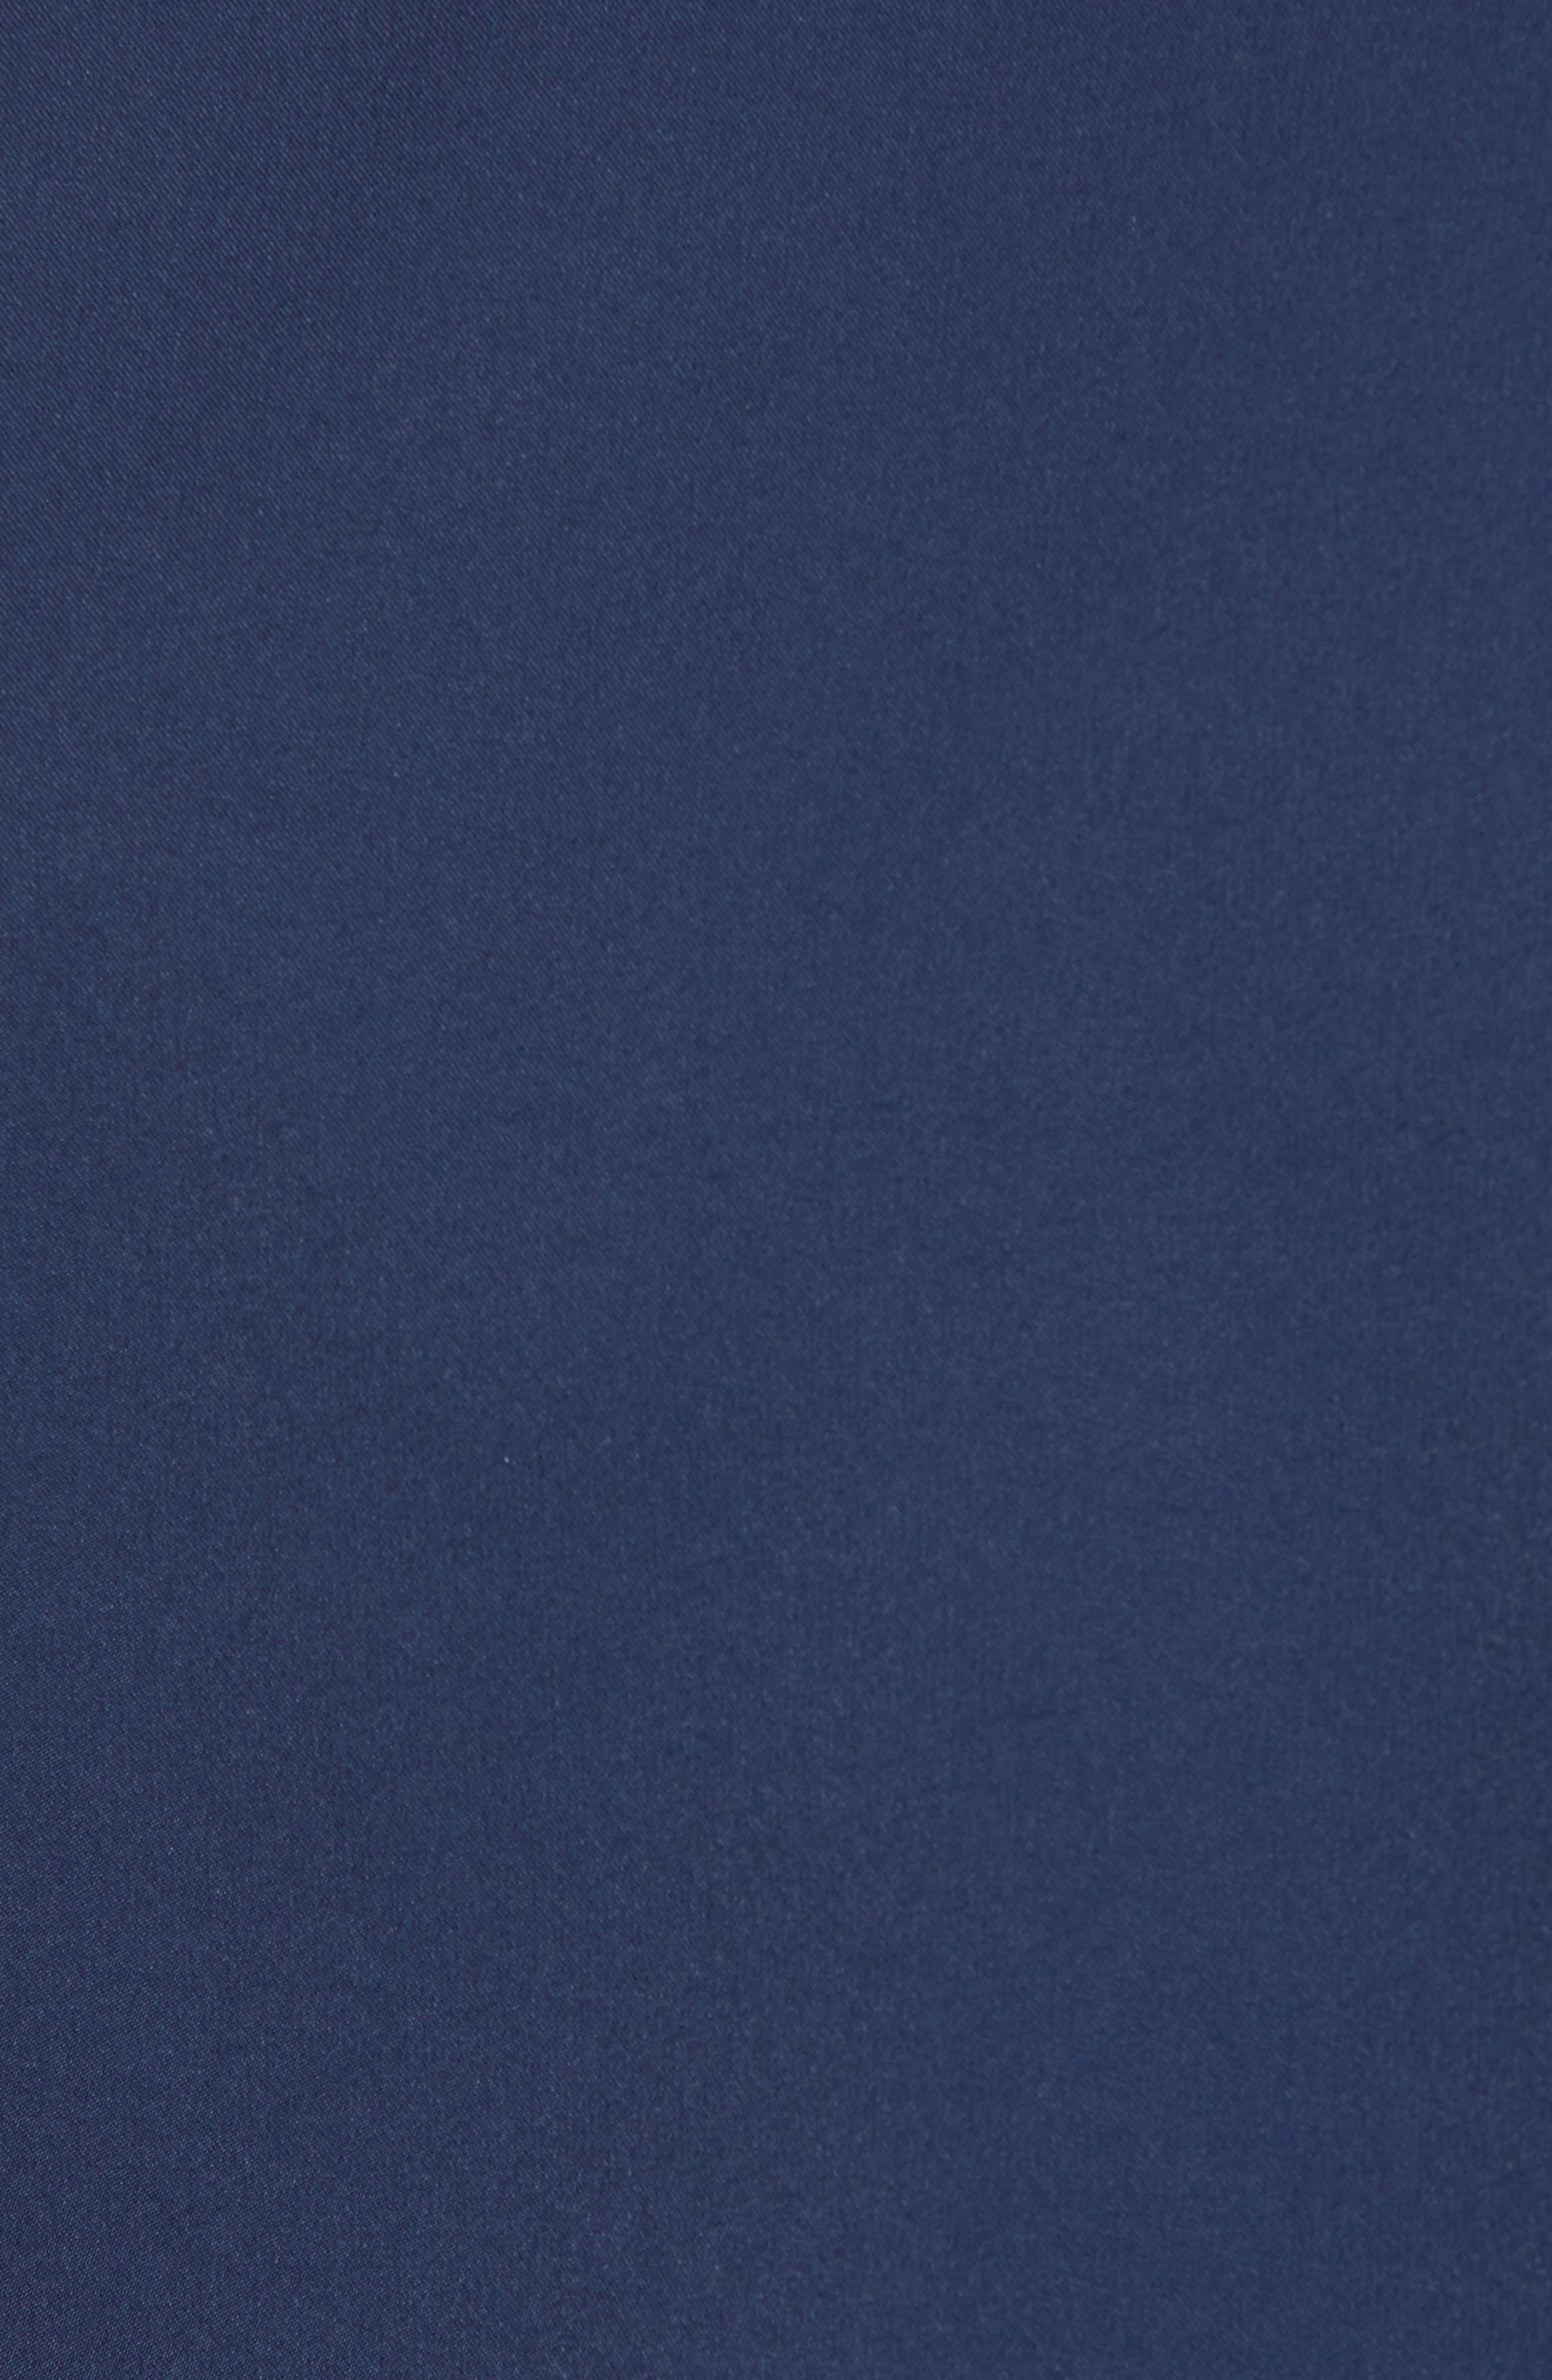 Furg HL Neoteric Bomber Jacket,                             Alternate thumbnail 5, color,                             Victory